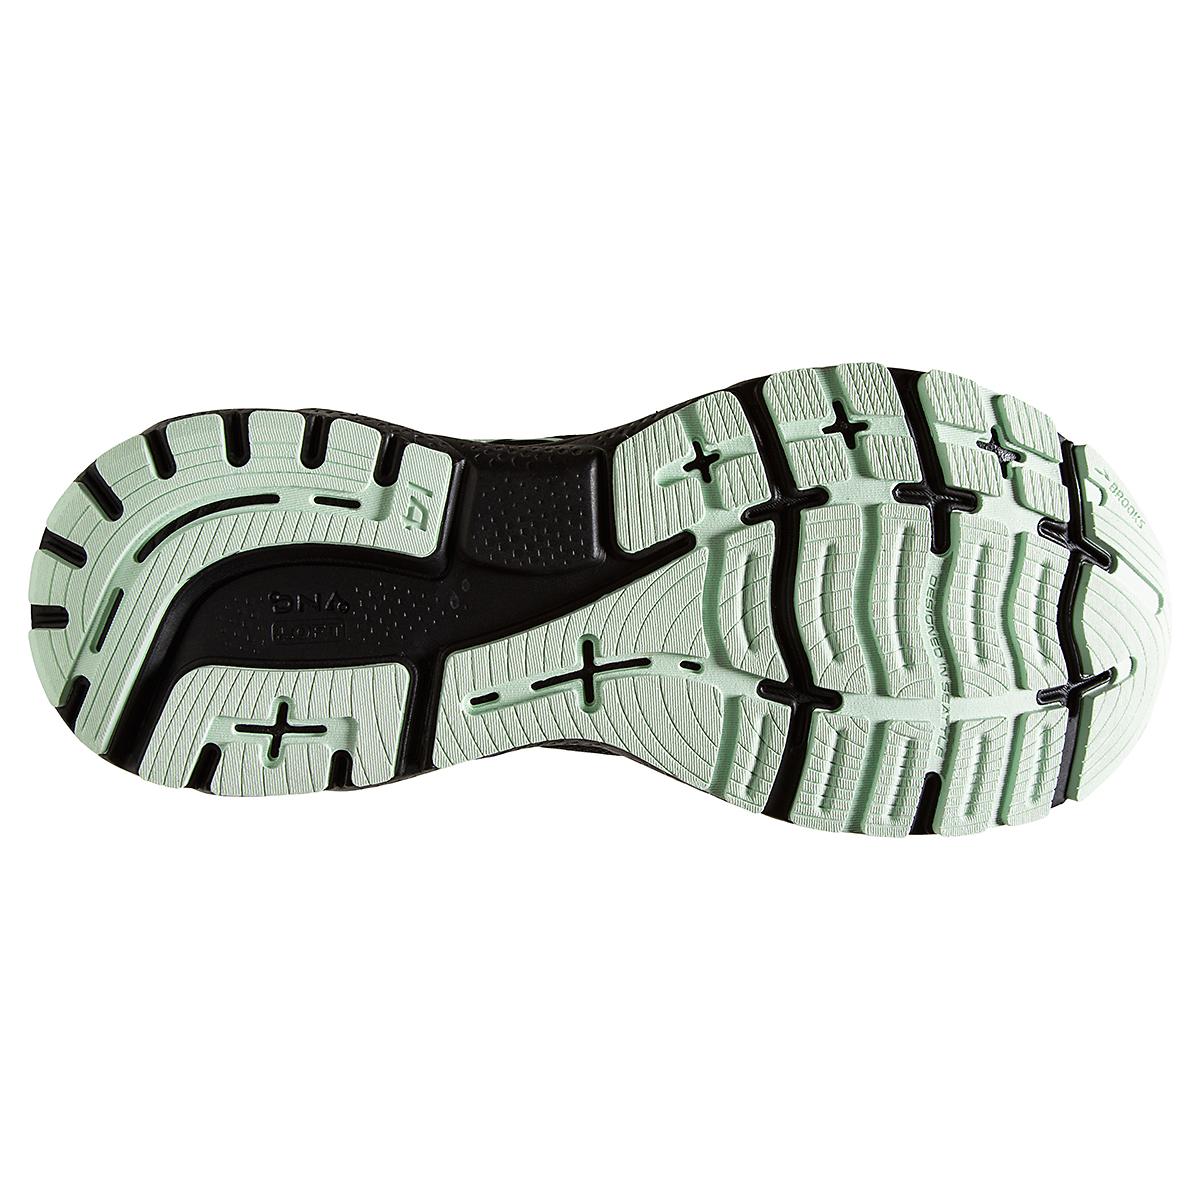 Women's Brooks Ghost 14 Gore-Tex Running Shoe - Color: Black/Blackened Pearl/Aquaglass - Size: 5 - Width: Regular, Black/Blackened Pearl/Aquaglass, large, image 4